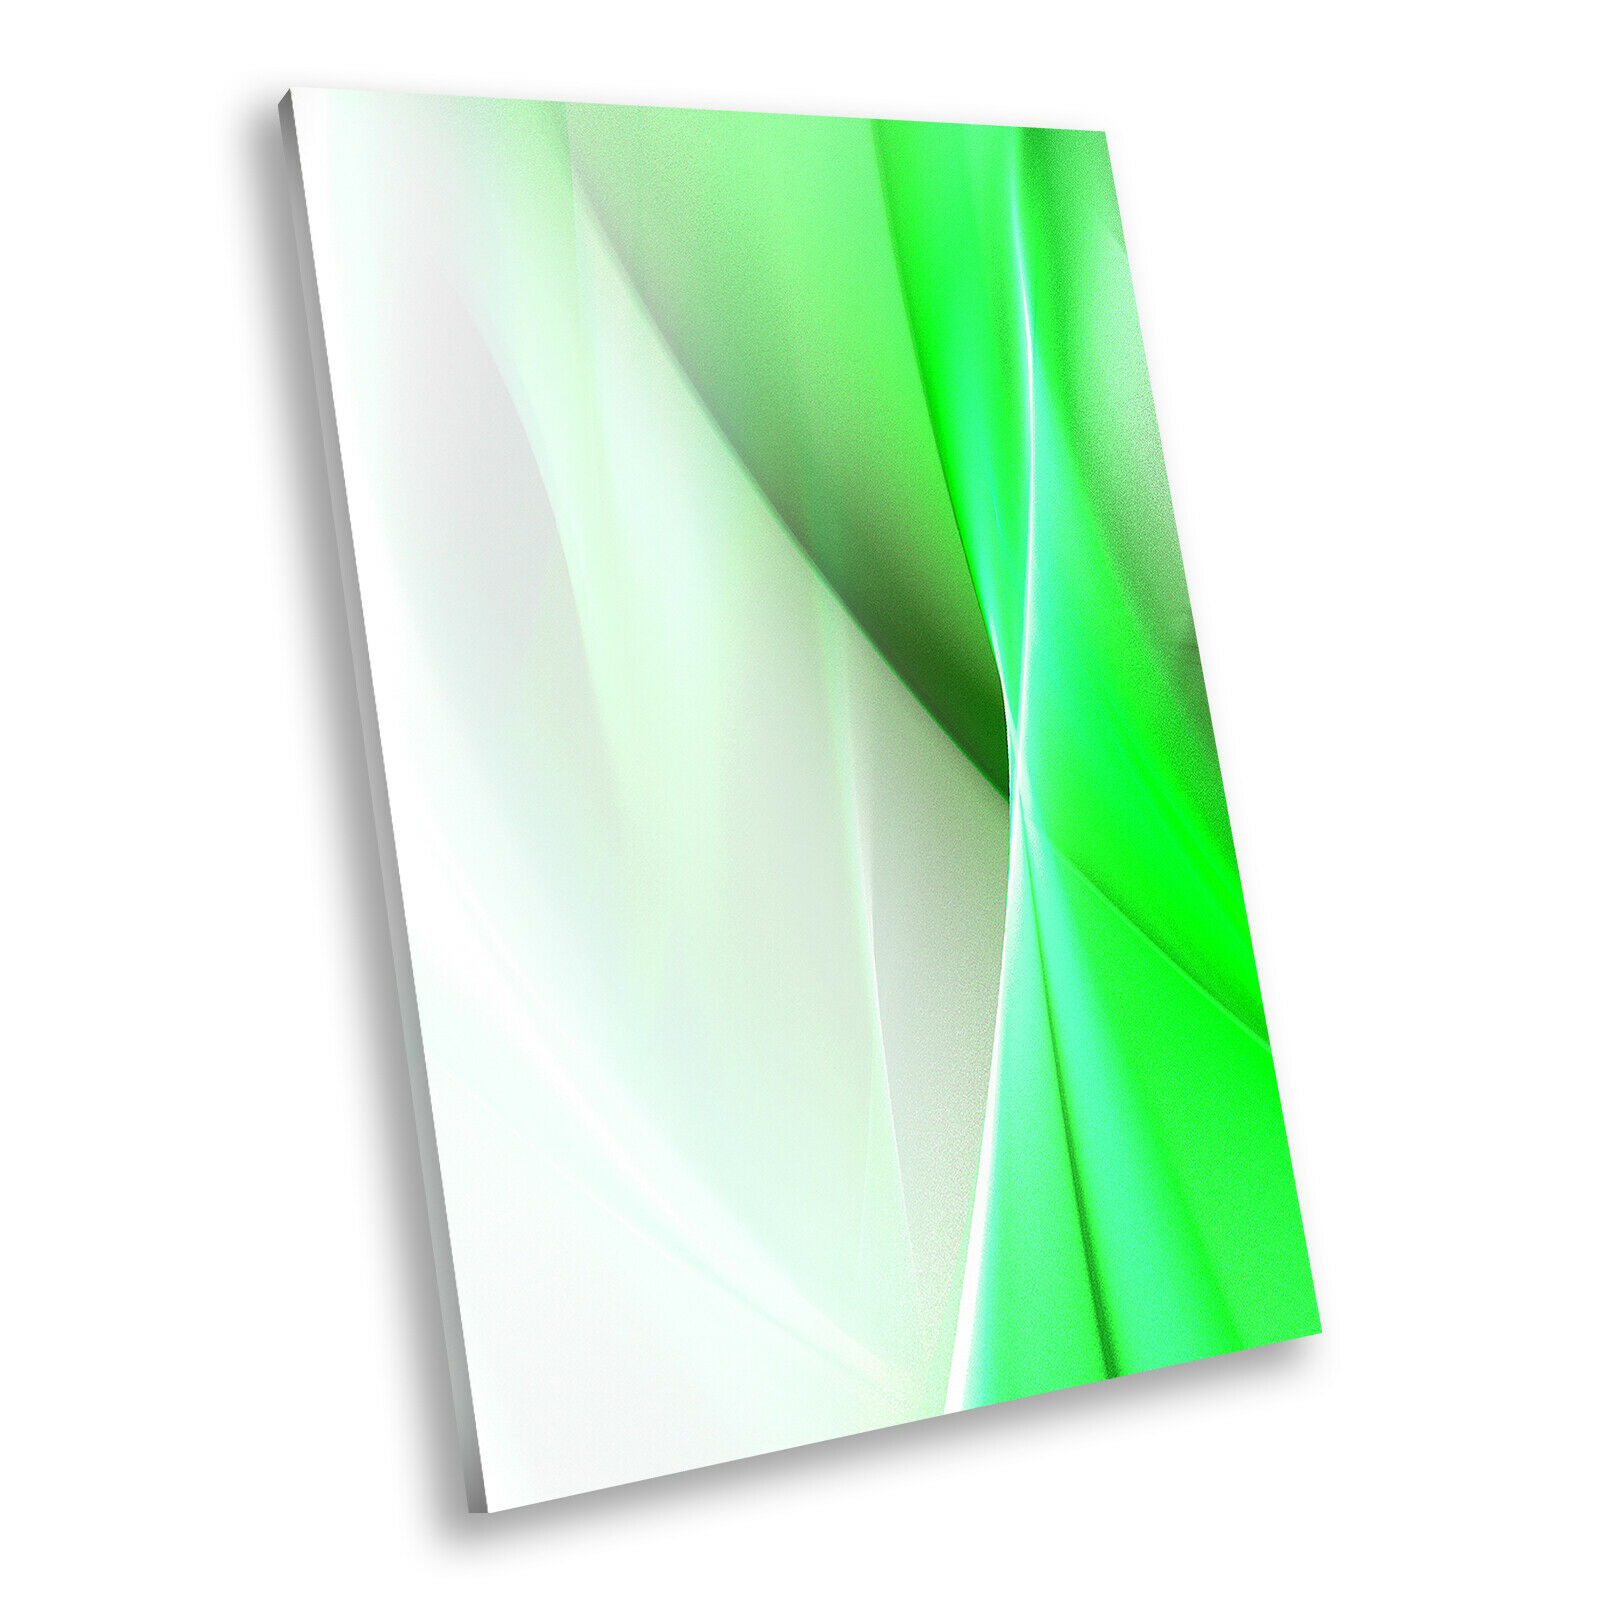 Grün Weiß Spiral Portrait Abstract Canvas Framed Art Large Picture